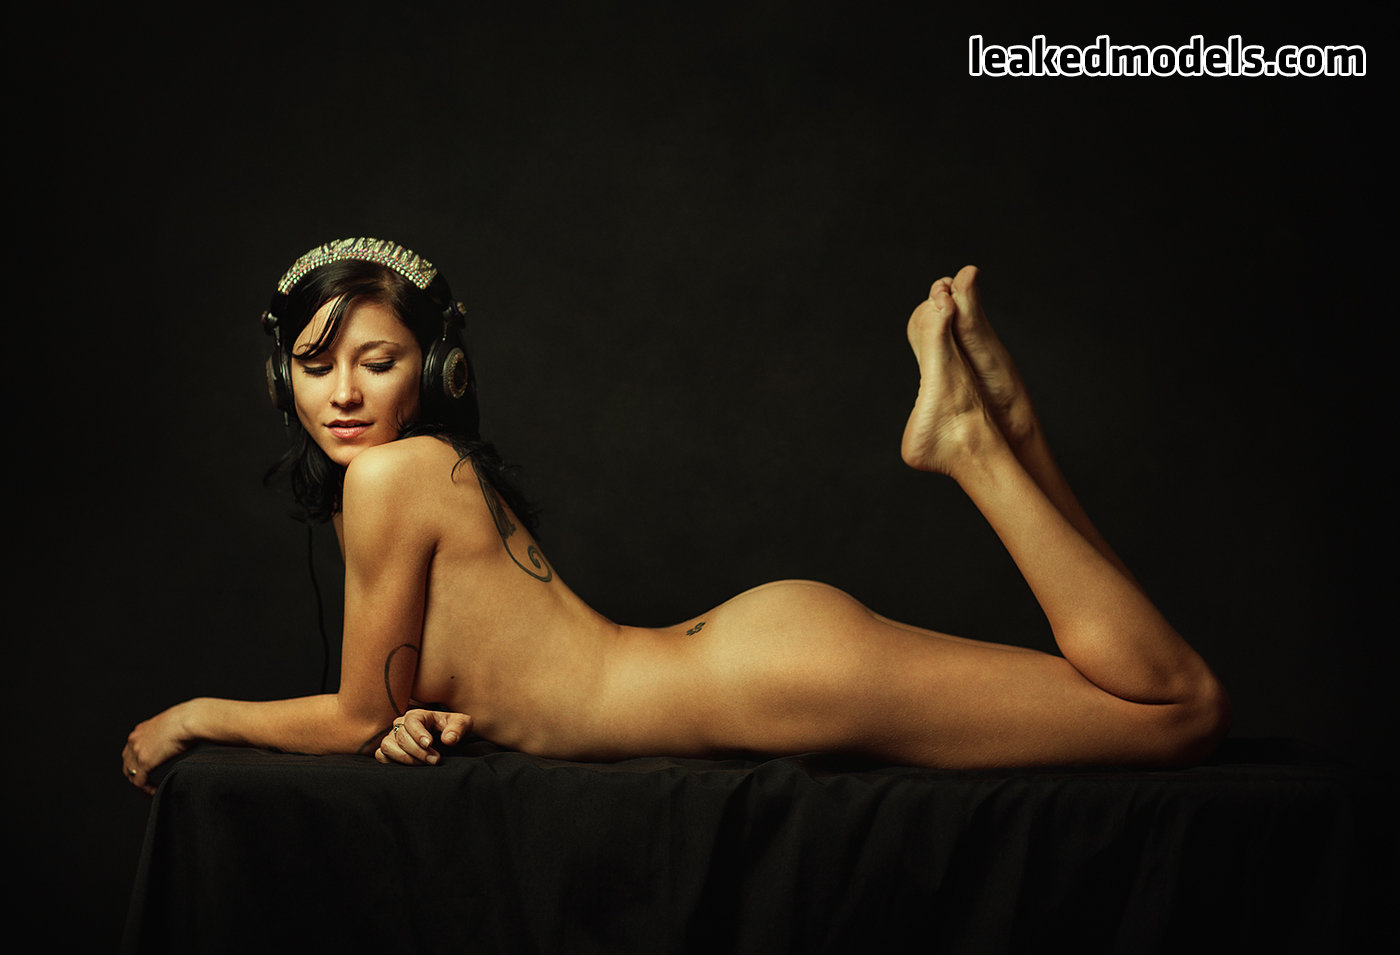 Anna Cavalli Instagram Nude Leaks (18 Photos)